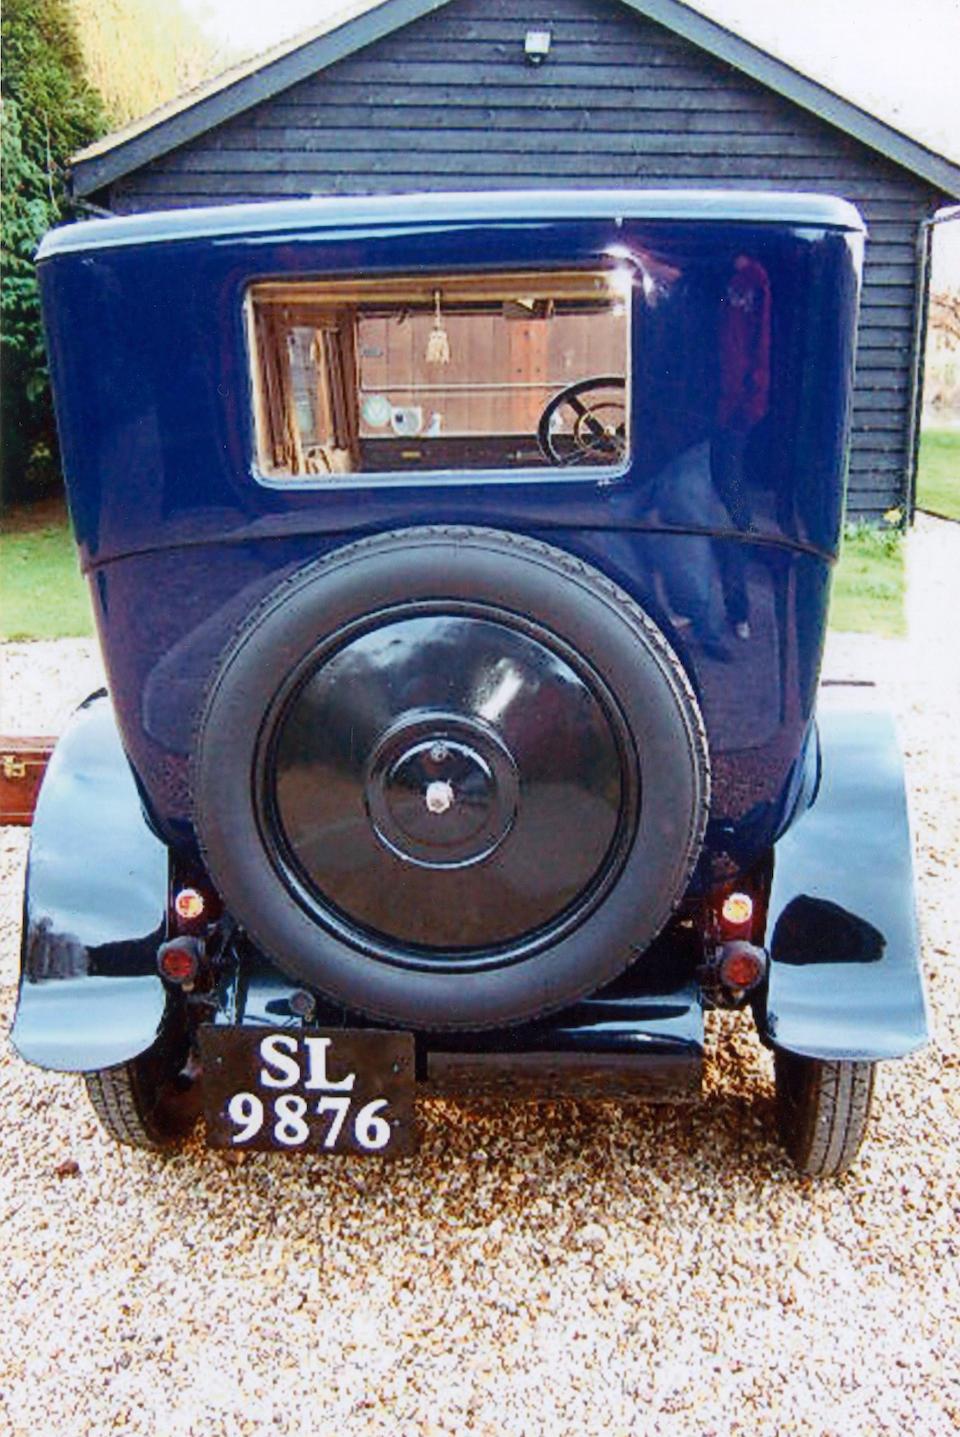 1914 Rochet-Schneider 12hp Limousine  Chassis no. 11905